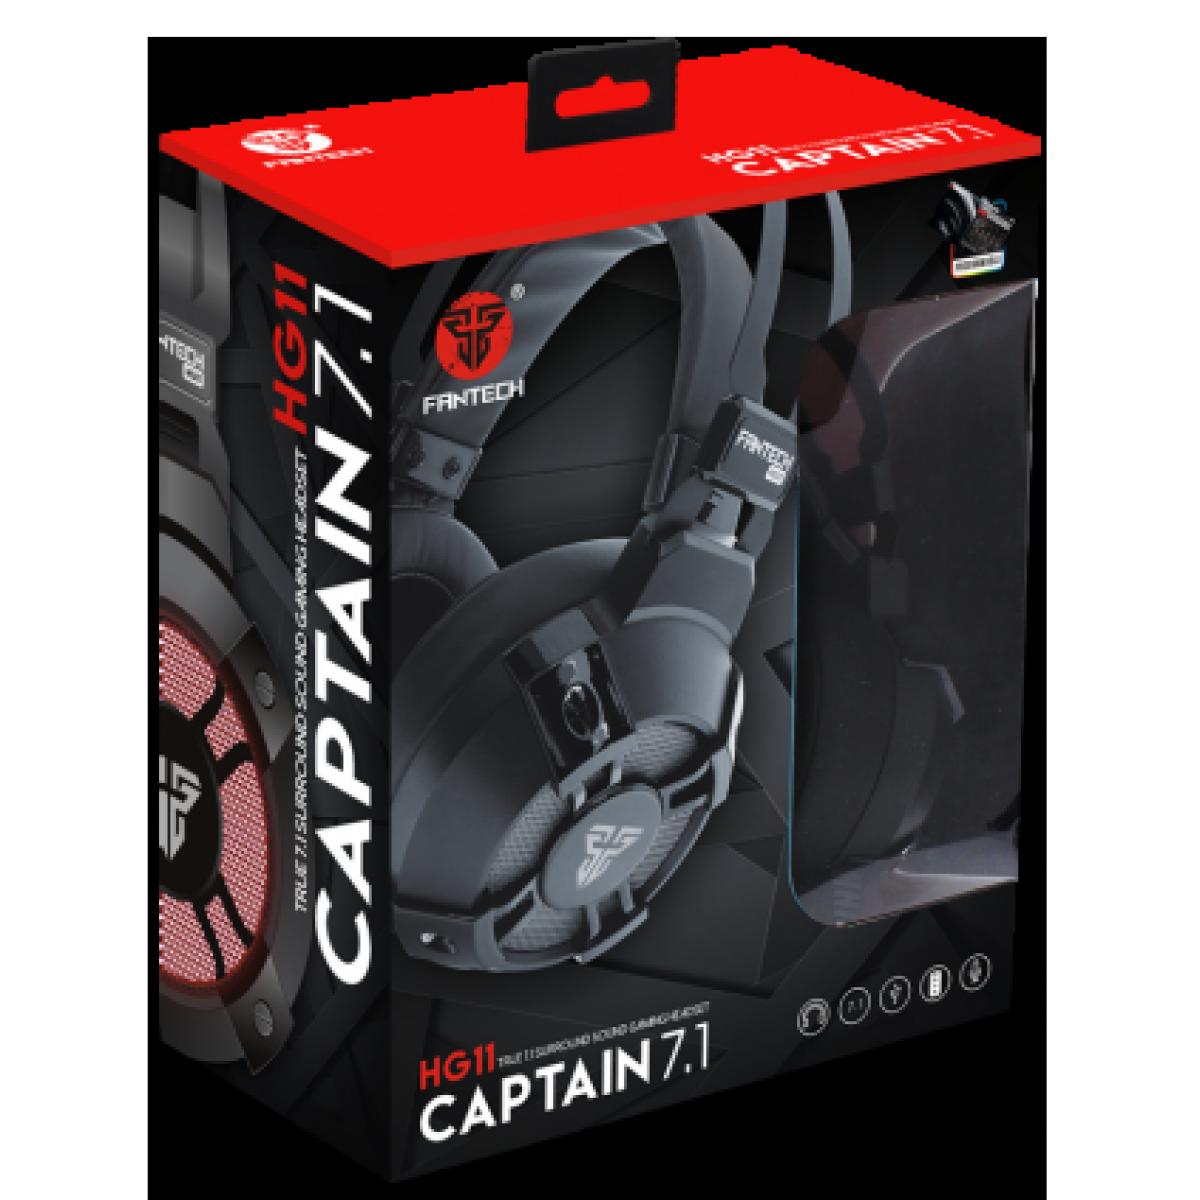 Headset Gamer Fantech Captain, 7.1 Surround, USB, RGB, Black, HG11